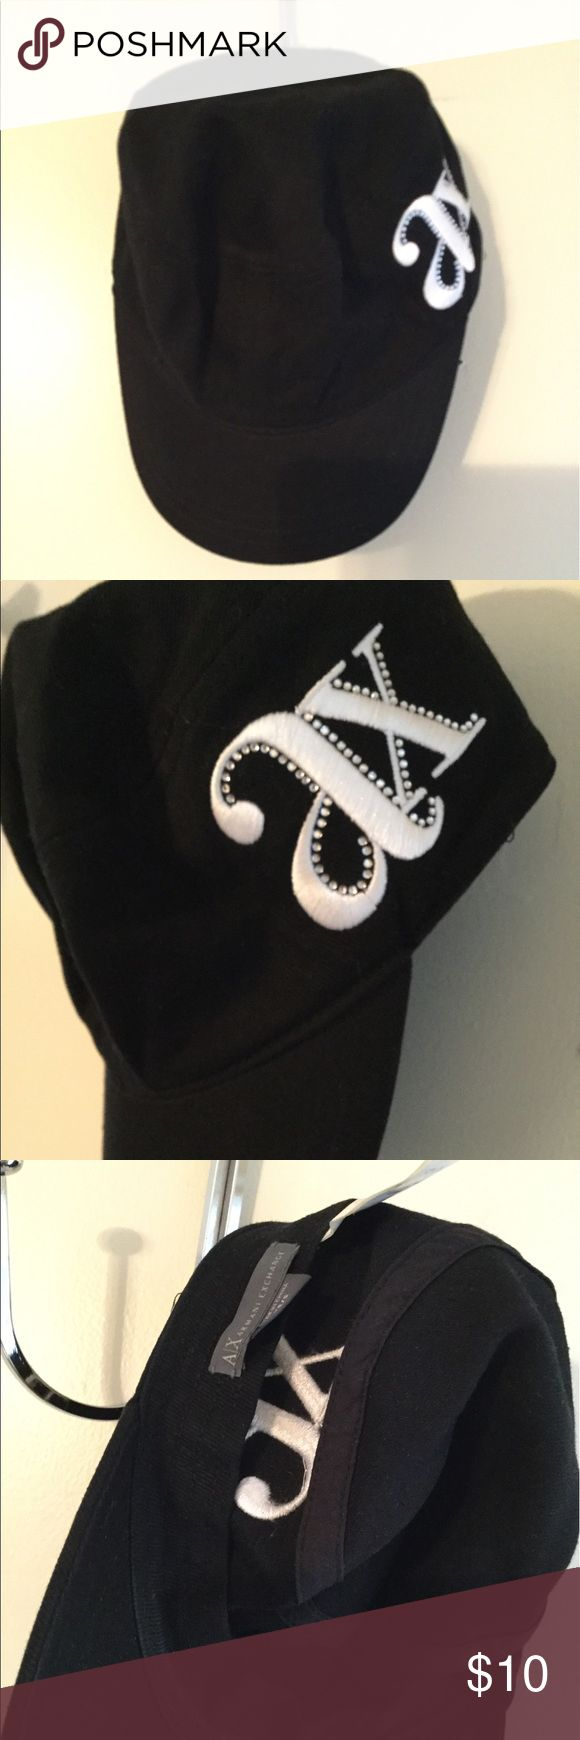 Hat Armani exchange military style hat A/X Armani Exchange Accessories Hats